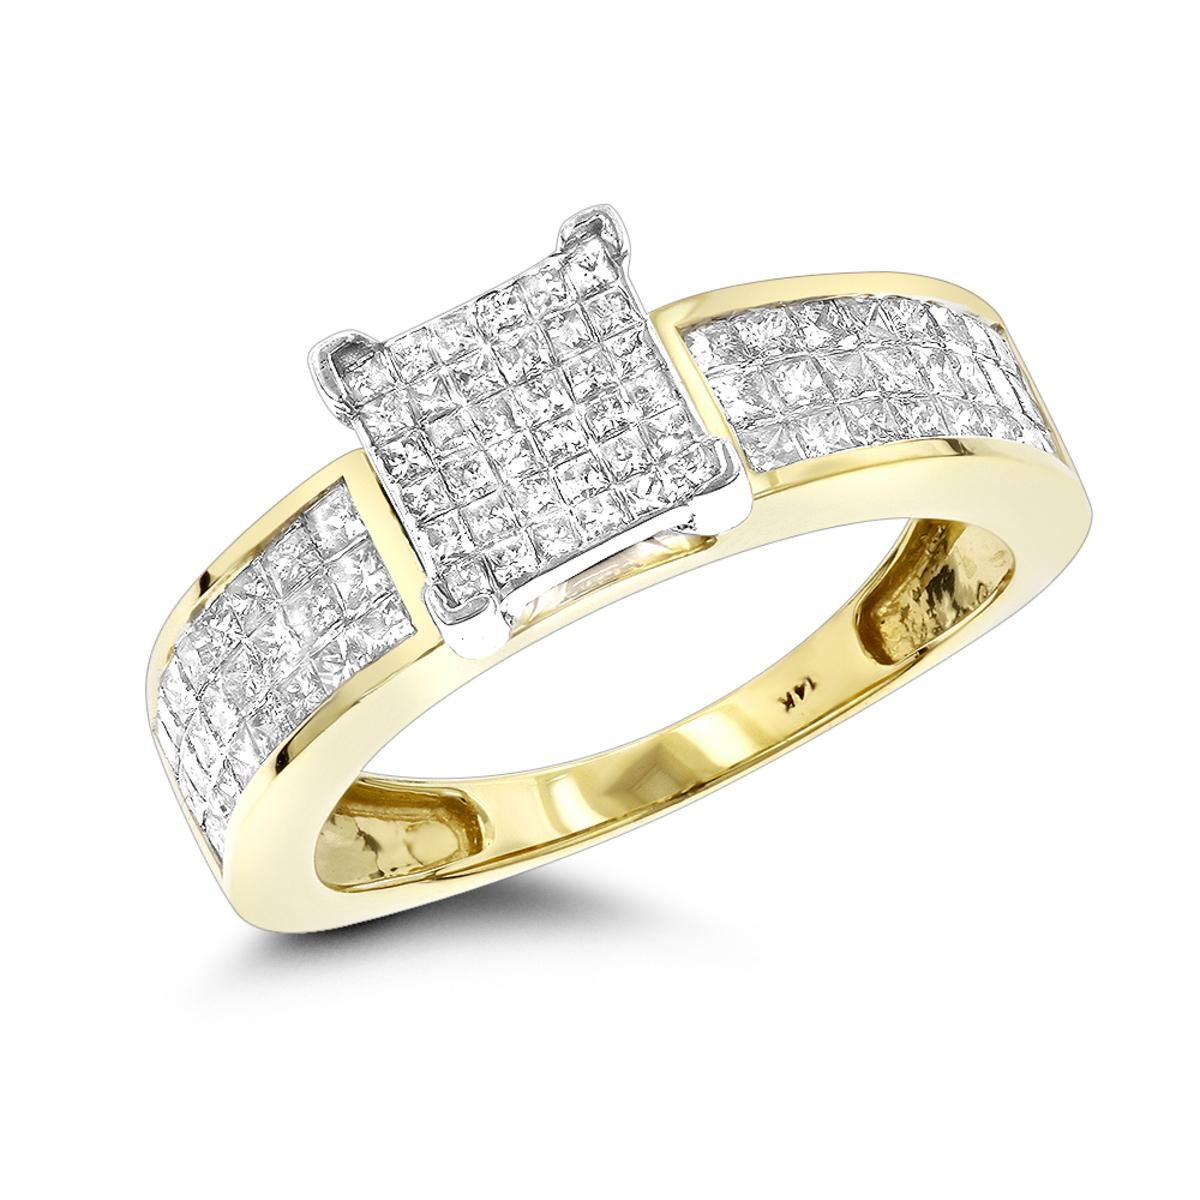 14K Pre-Set Princess Cut Diamond Engagement Ring 1.1